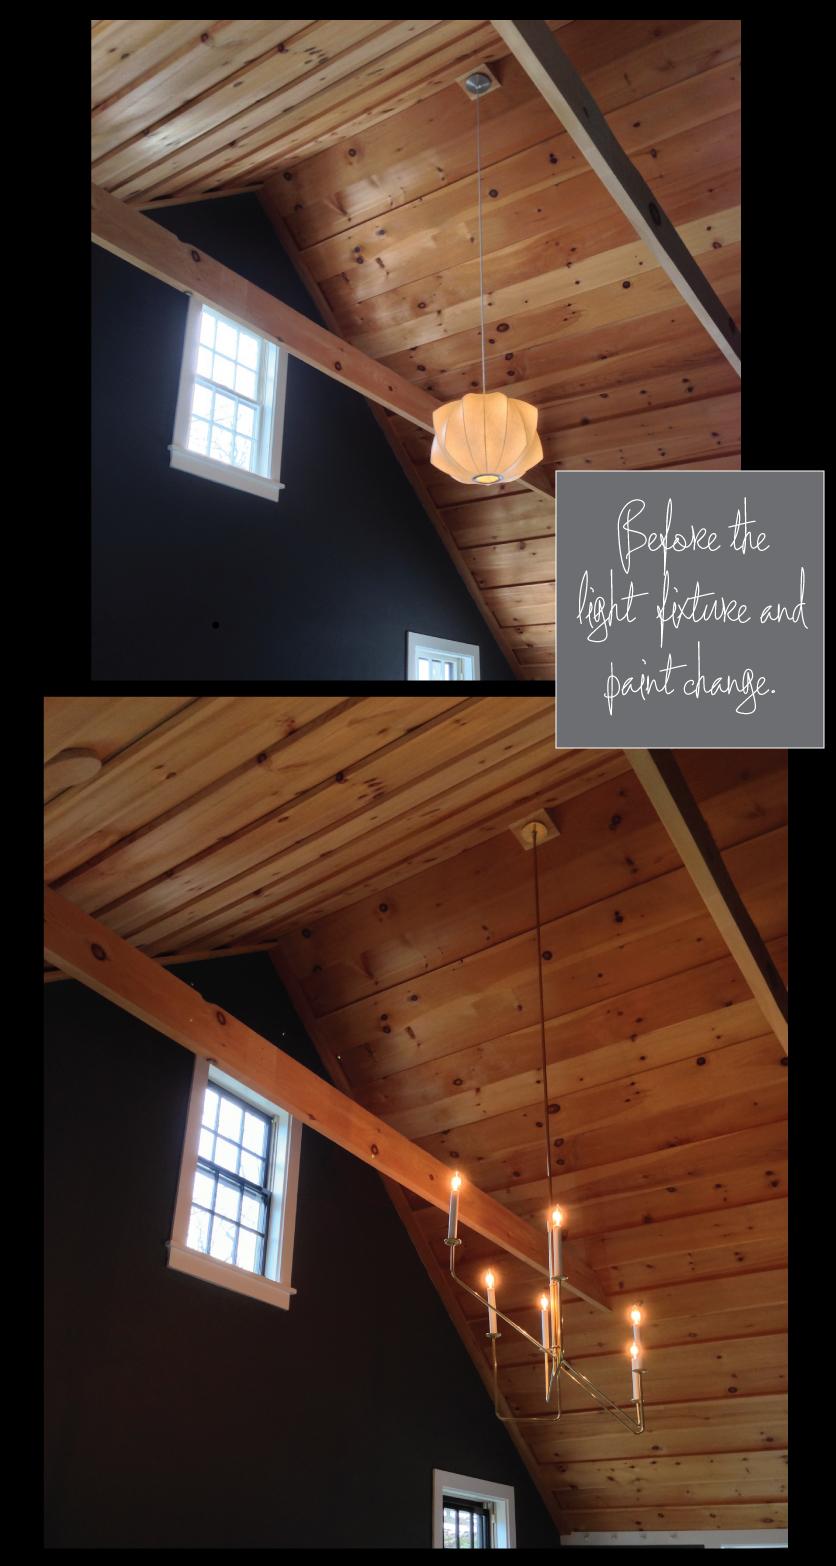 lighting-change-painting-sashes